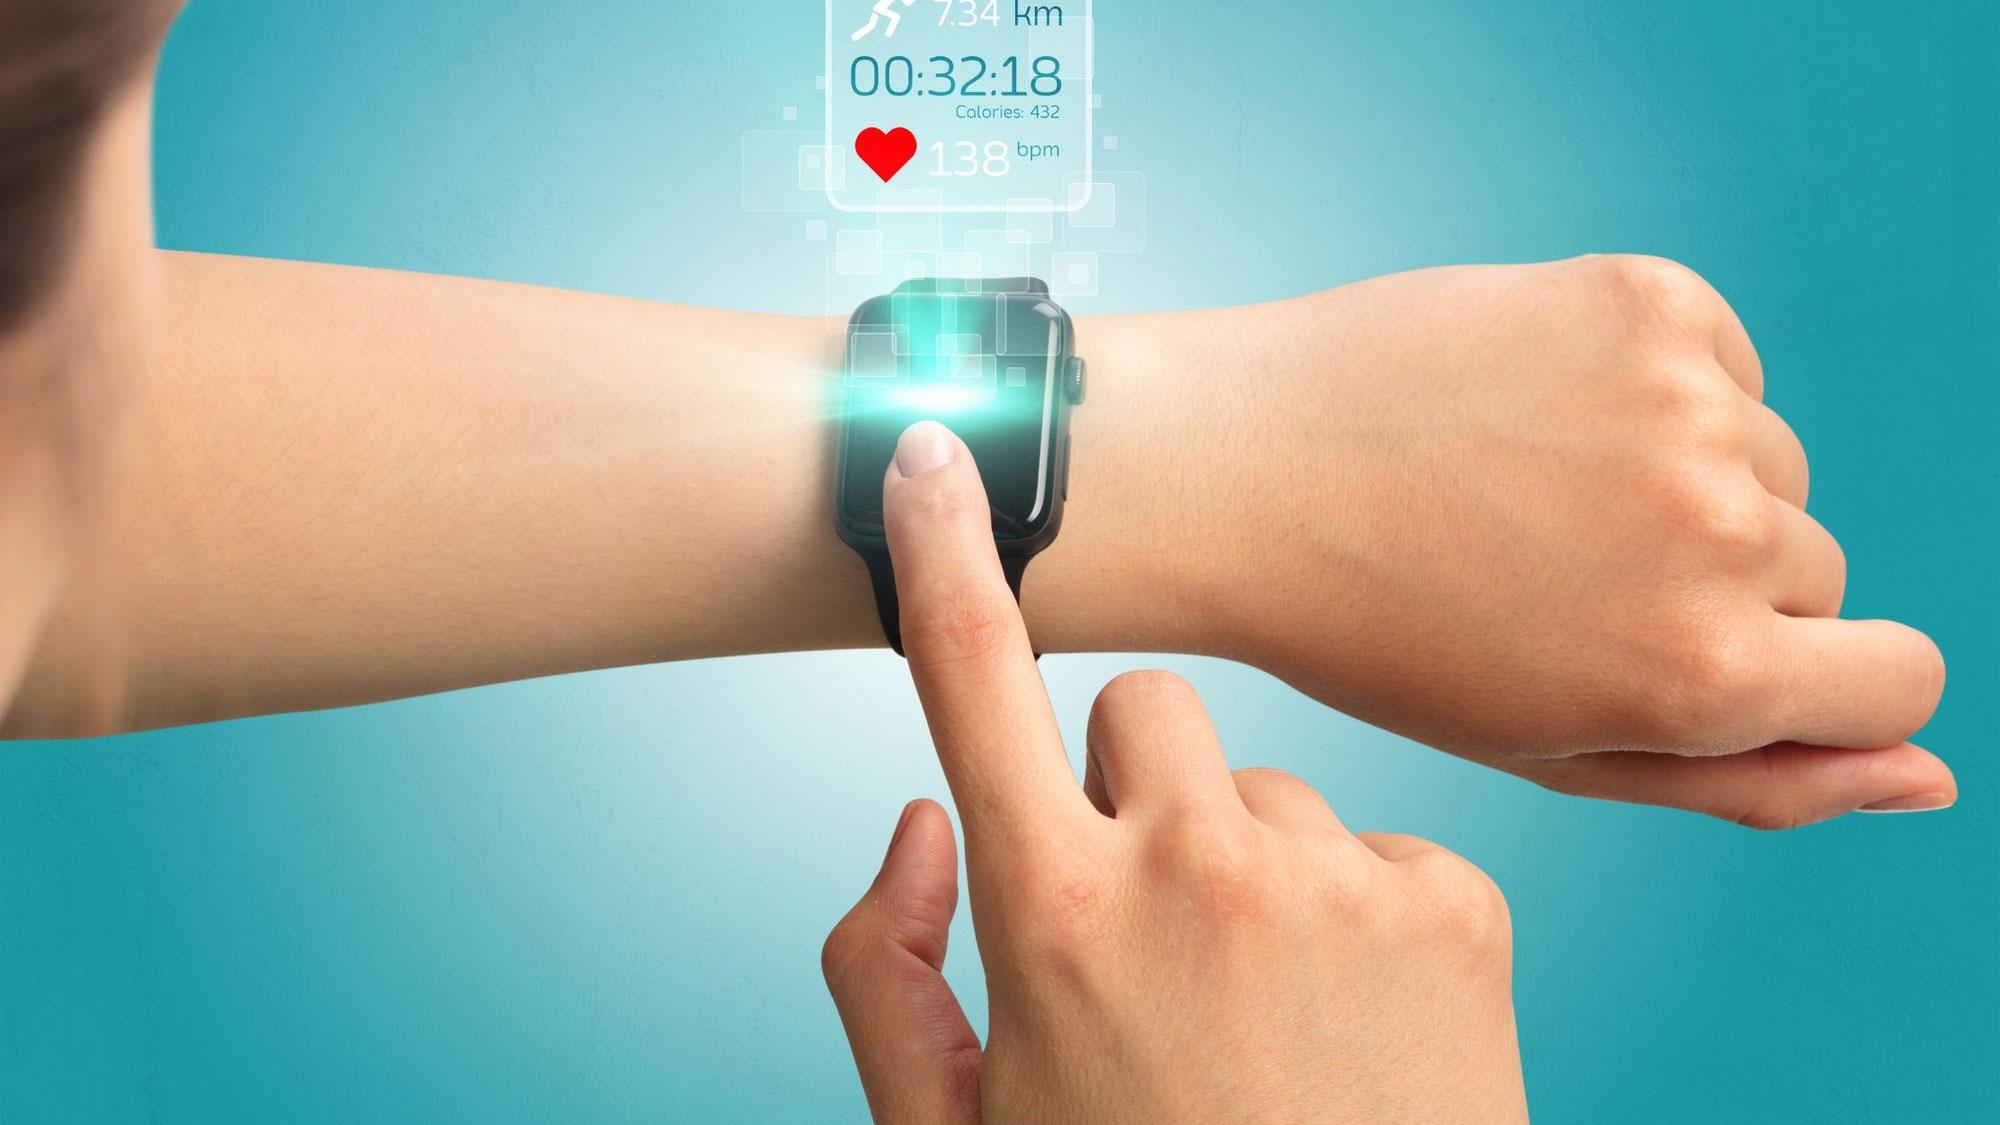 Xiaomi Mi Watch Lite GPS&GLONASS搭載 スマートウォッチなら、さくっと買えますね。